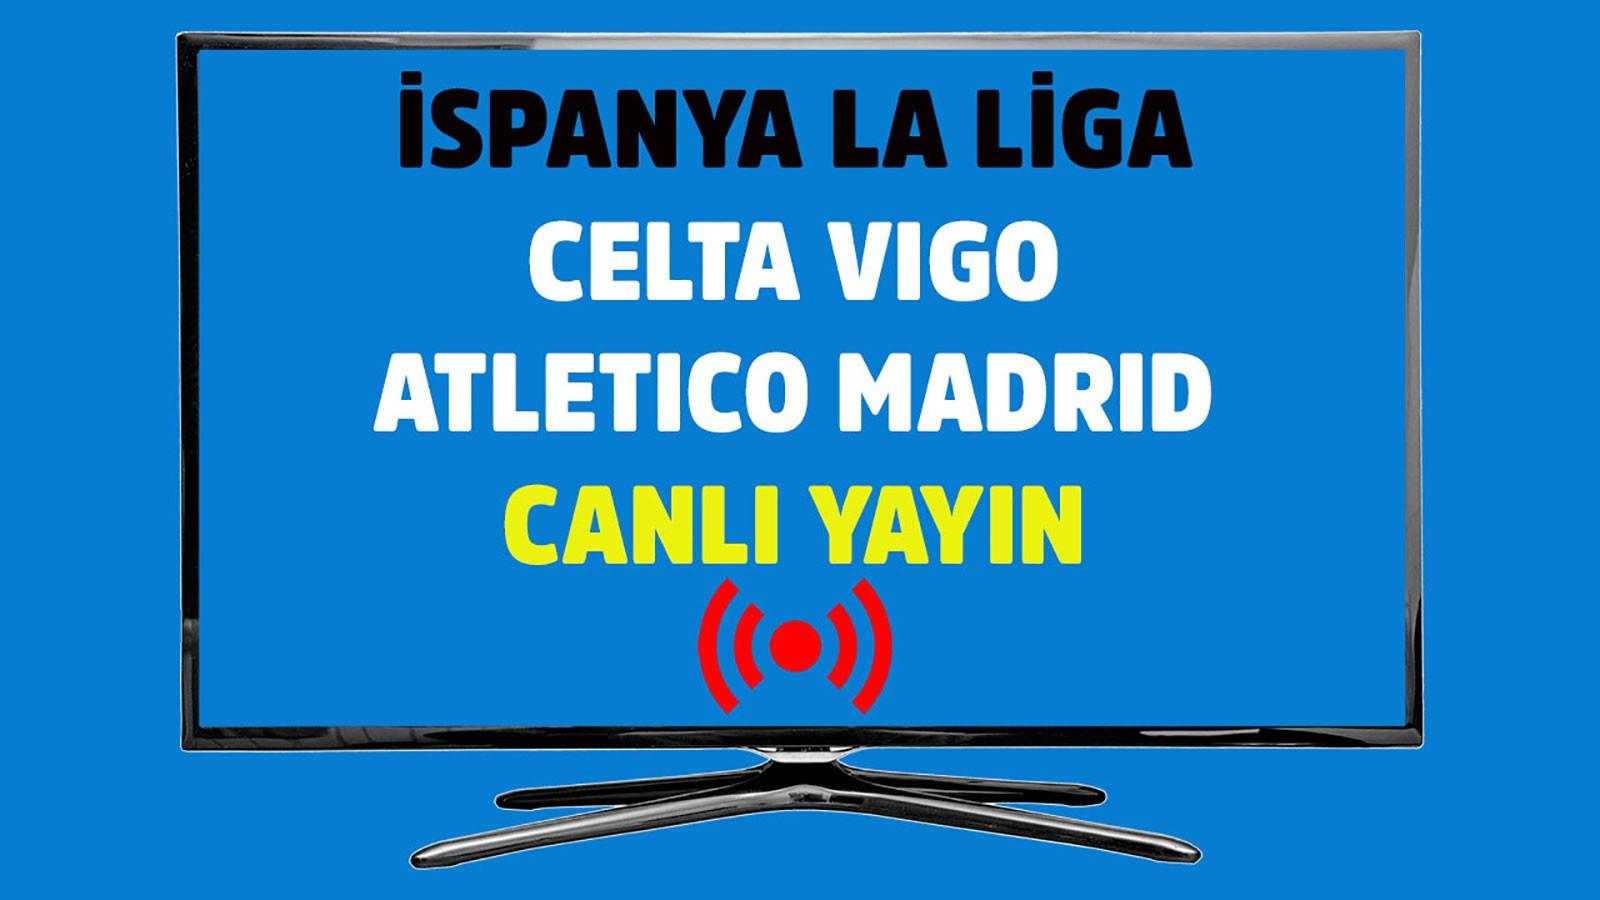 Celta Vigo - Atletico Madrid CANLI